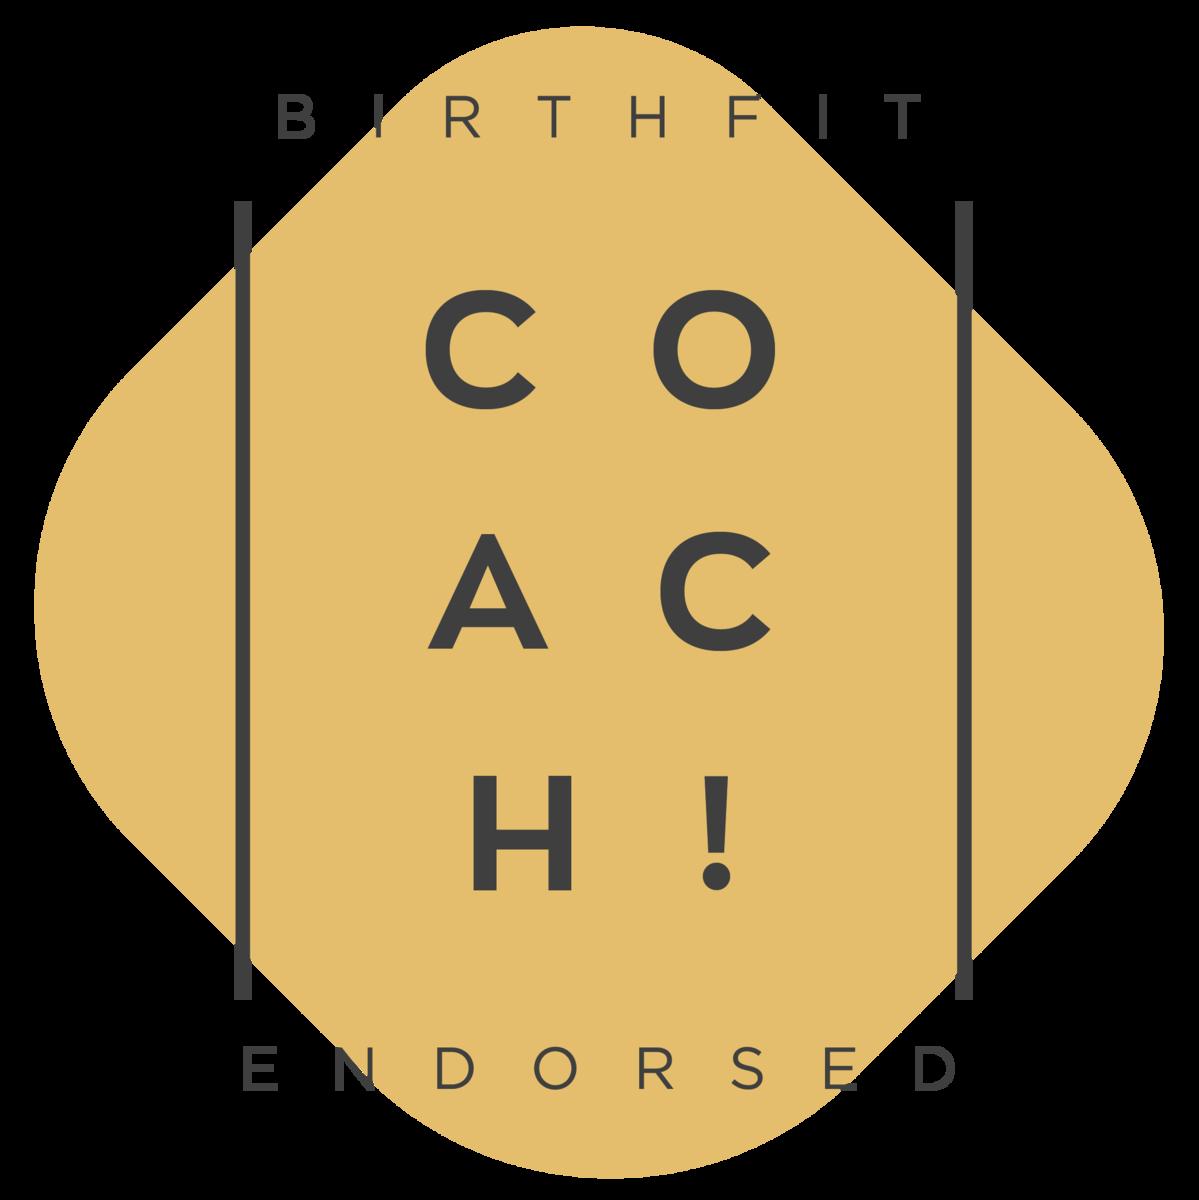 BIRTHFIT教练徽章